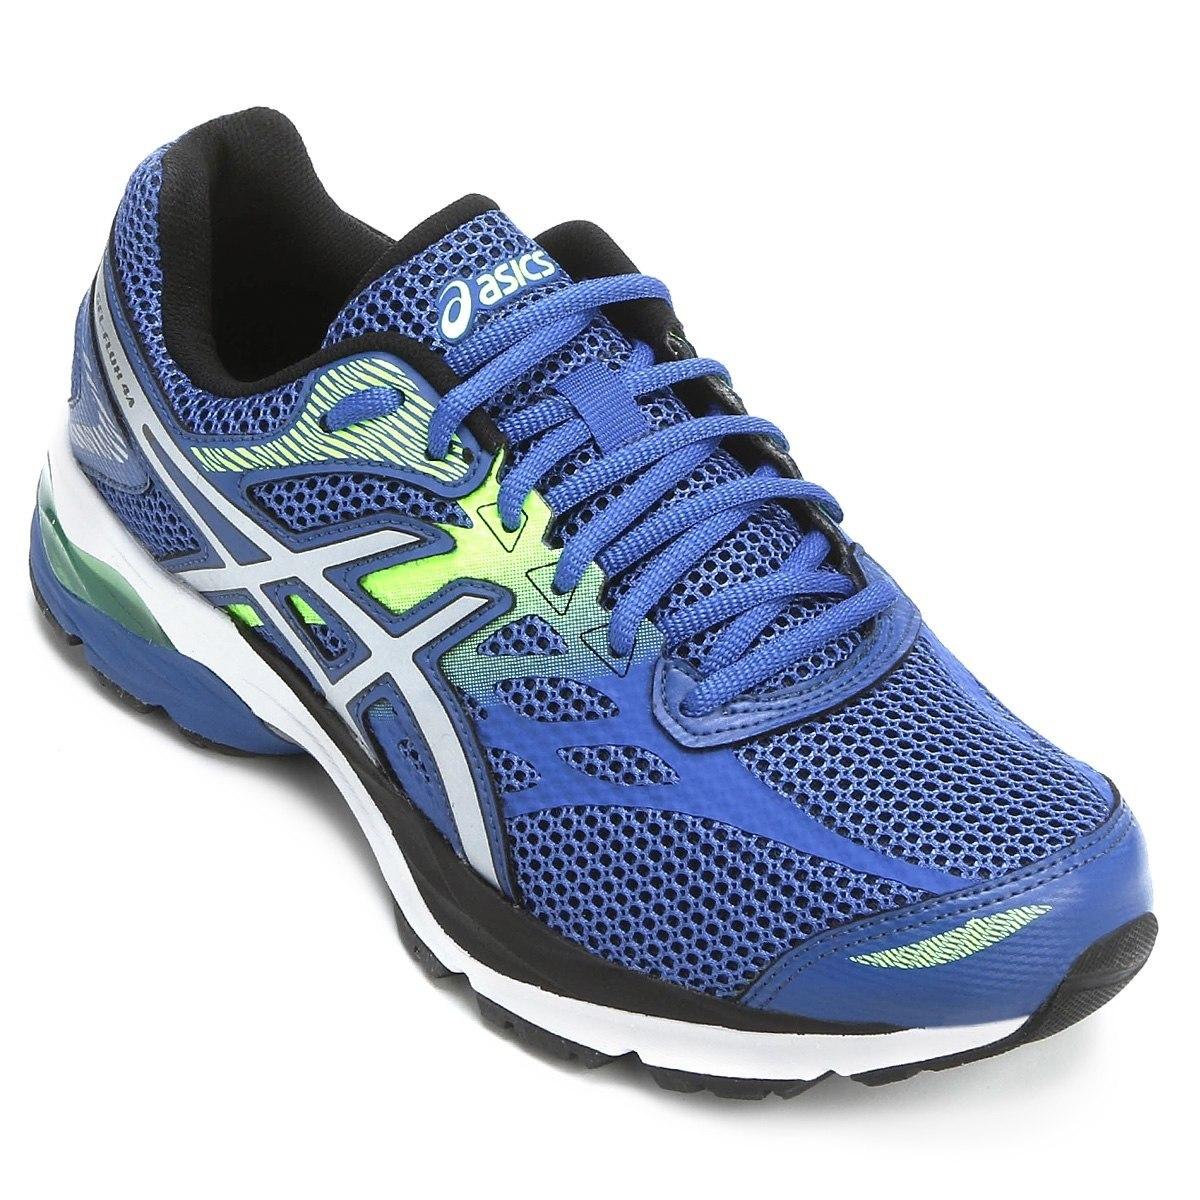 6c876a7cb0d tênis asics gel flux 4 a - masculino - running. Carregando zoom.